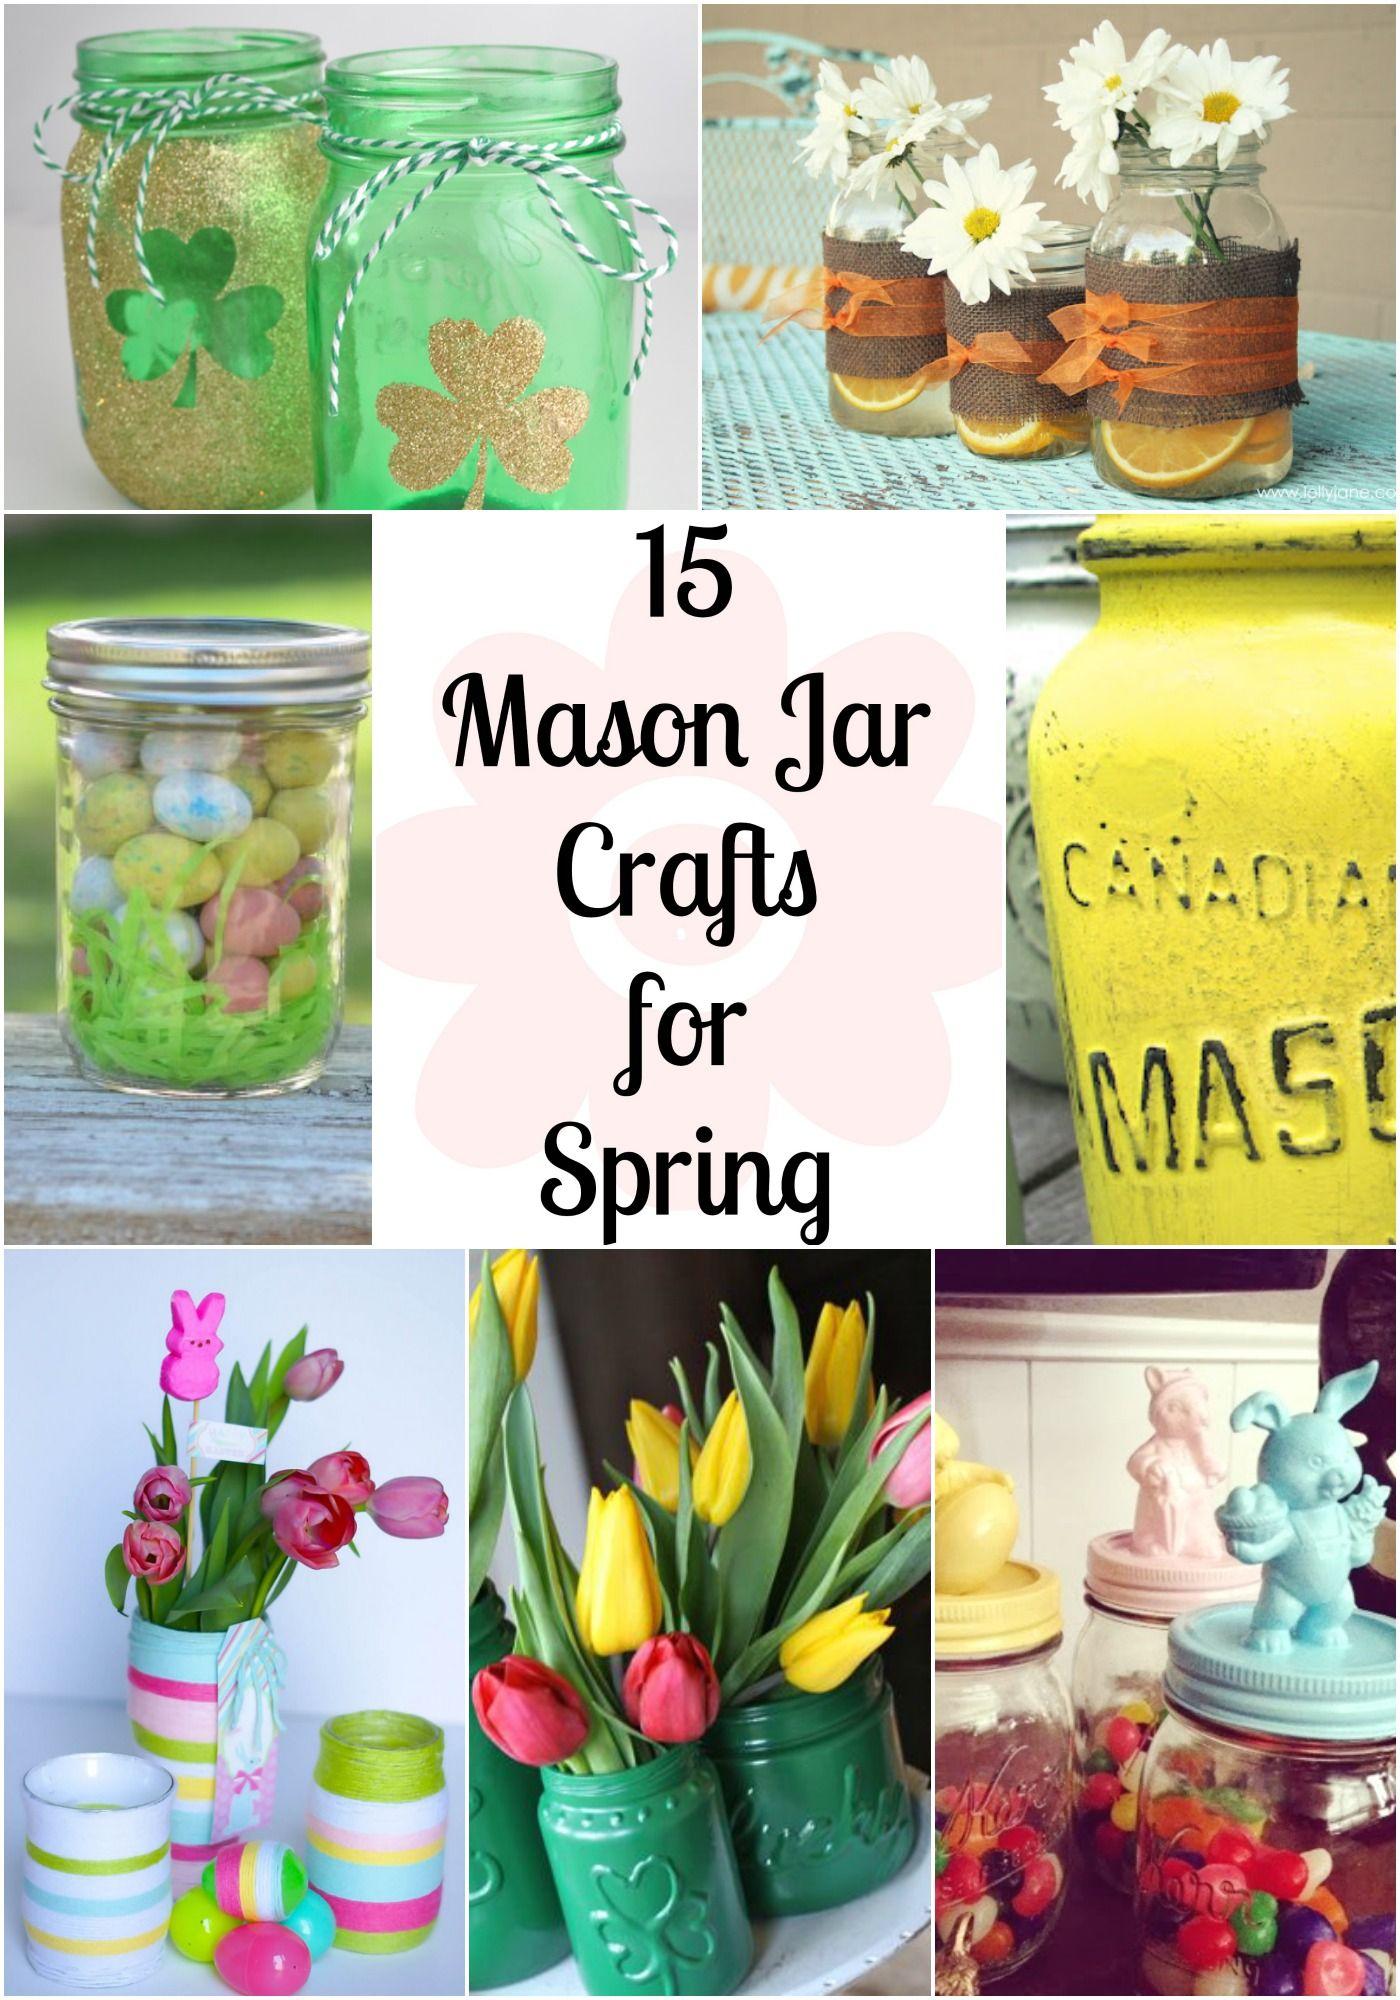 15 Mason Jar Crafts For Spring Easy Mason Jar Crafts Mason Jar